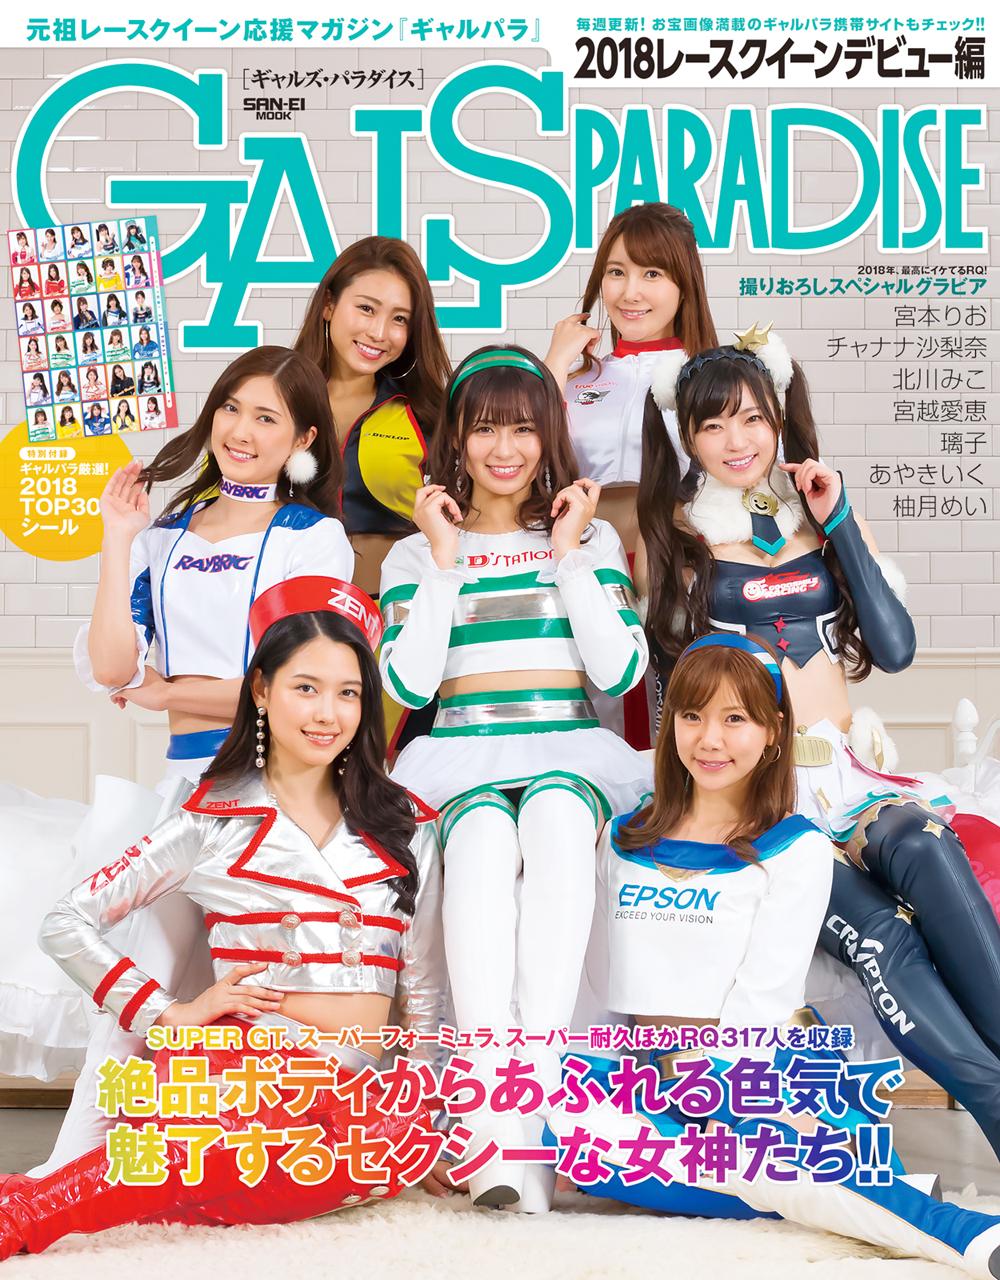 GALS PARADICE | GALS PARADISE 2018 レースクイーンデビュー編